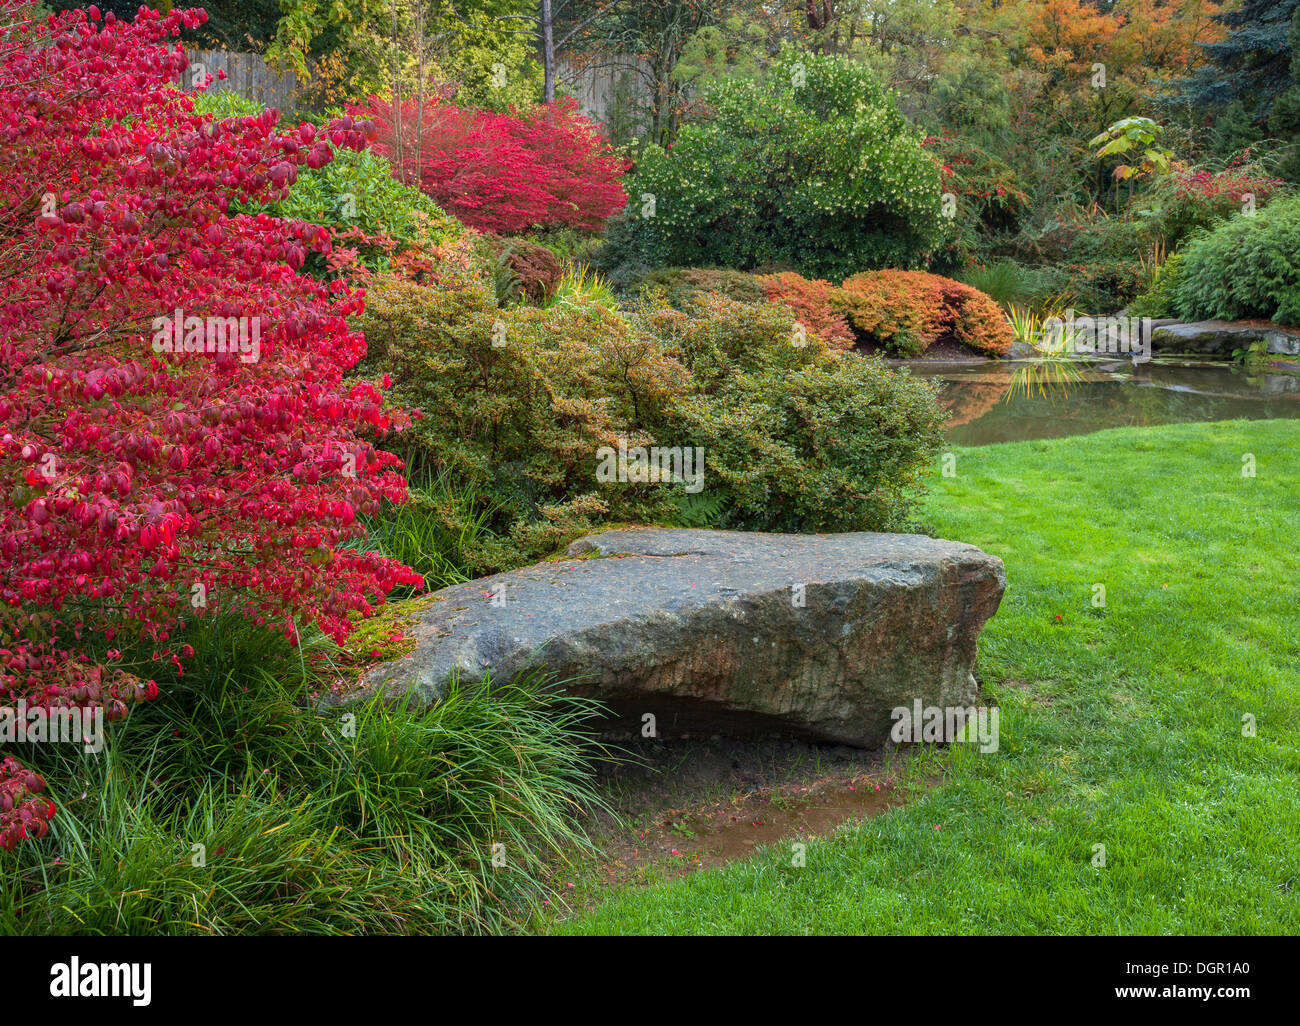 Kubota Gardens Seattle WA Vibrant red autumn leaves of burning